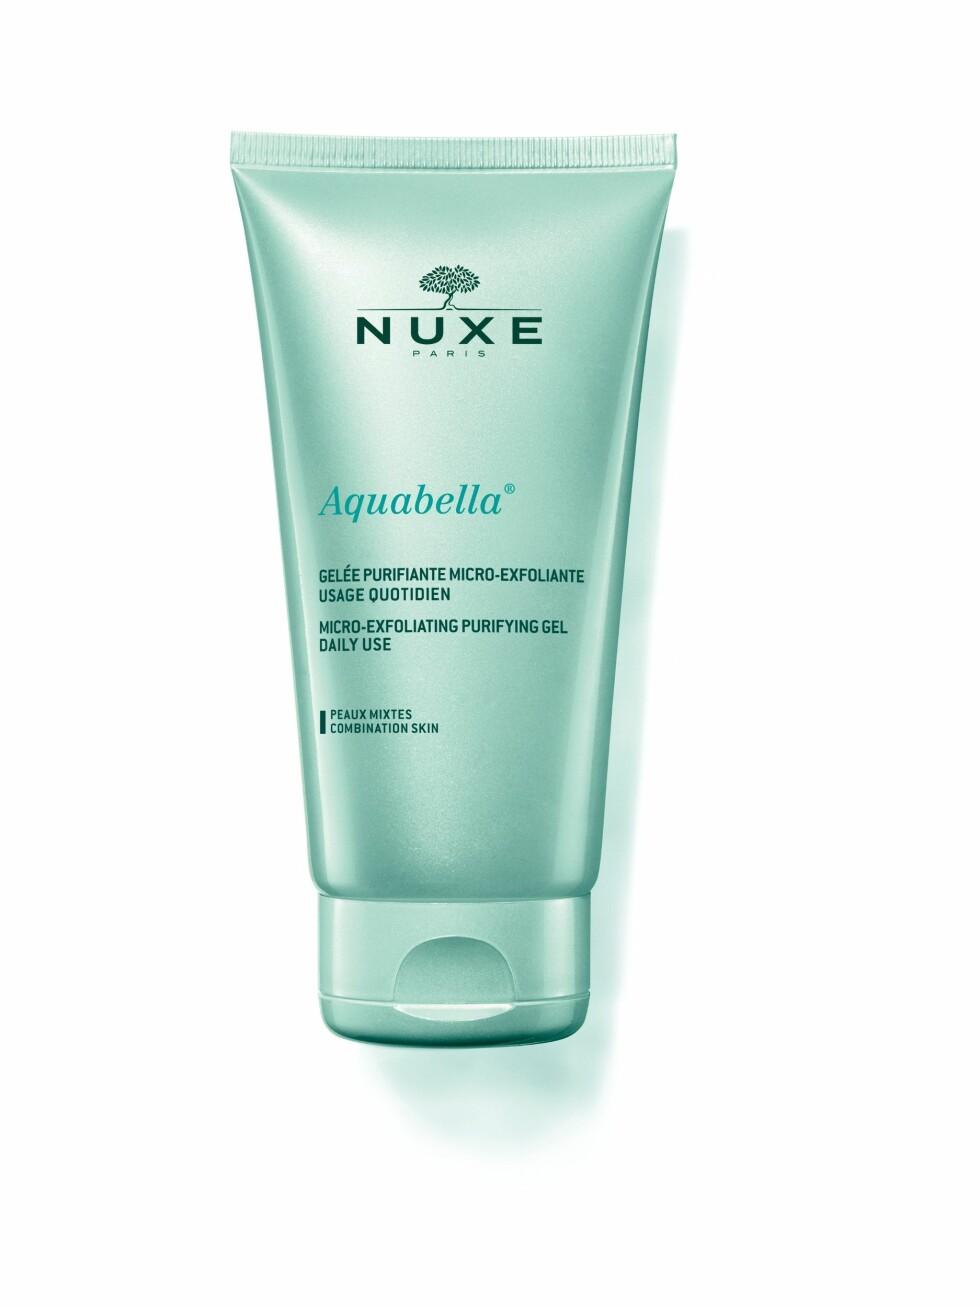 Micro-exfoliating gel  | Aquabella | https://www.apotek1.no/produkter/nuxe-aquabella-micro-exfoliating-gel-810953p?utm_source=KK.no&utm_medium=Advetorial&utm_campaign=Nuxe%20Aquabella